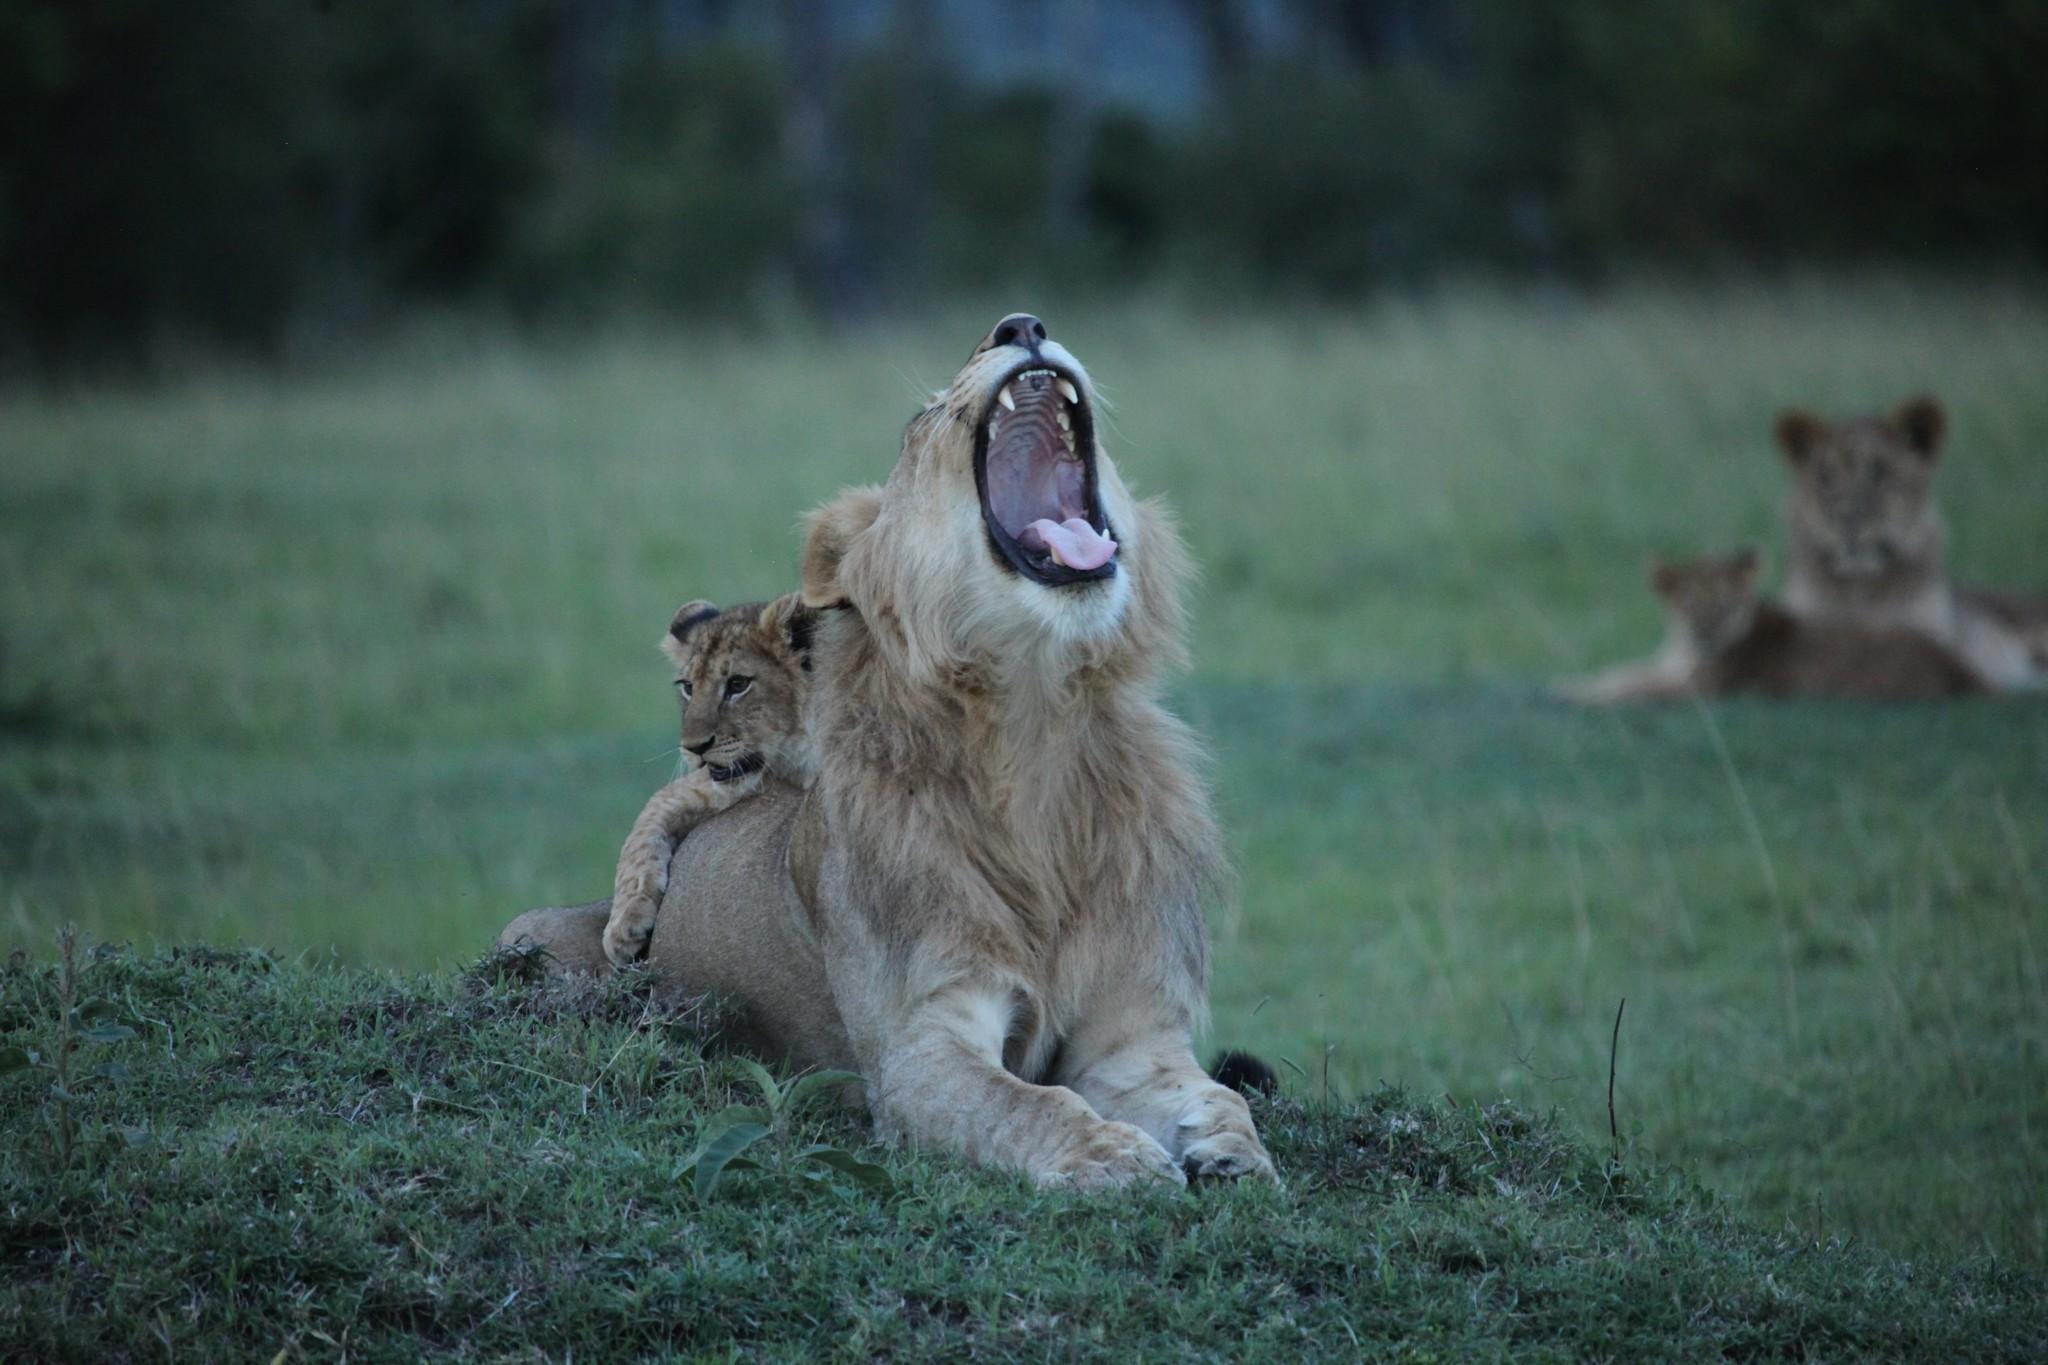 Lions in Maasai Mara National Reserve